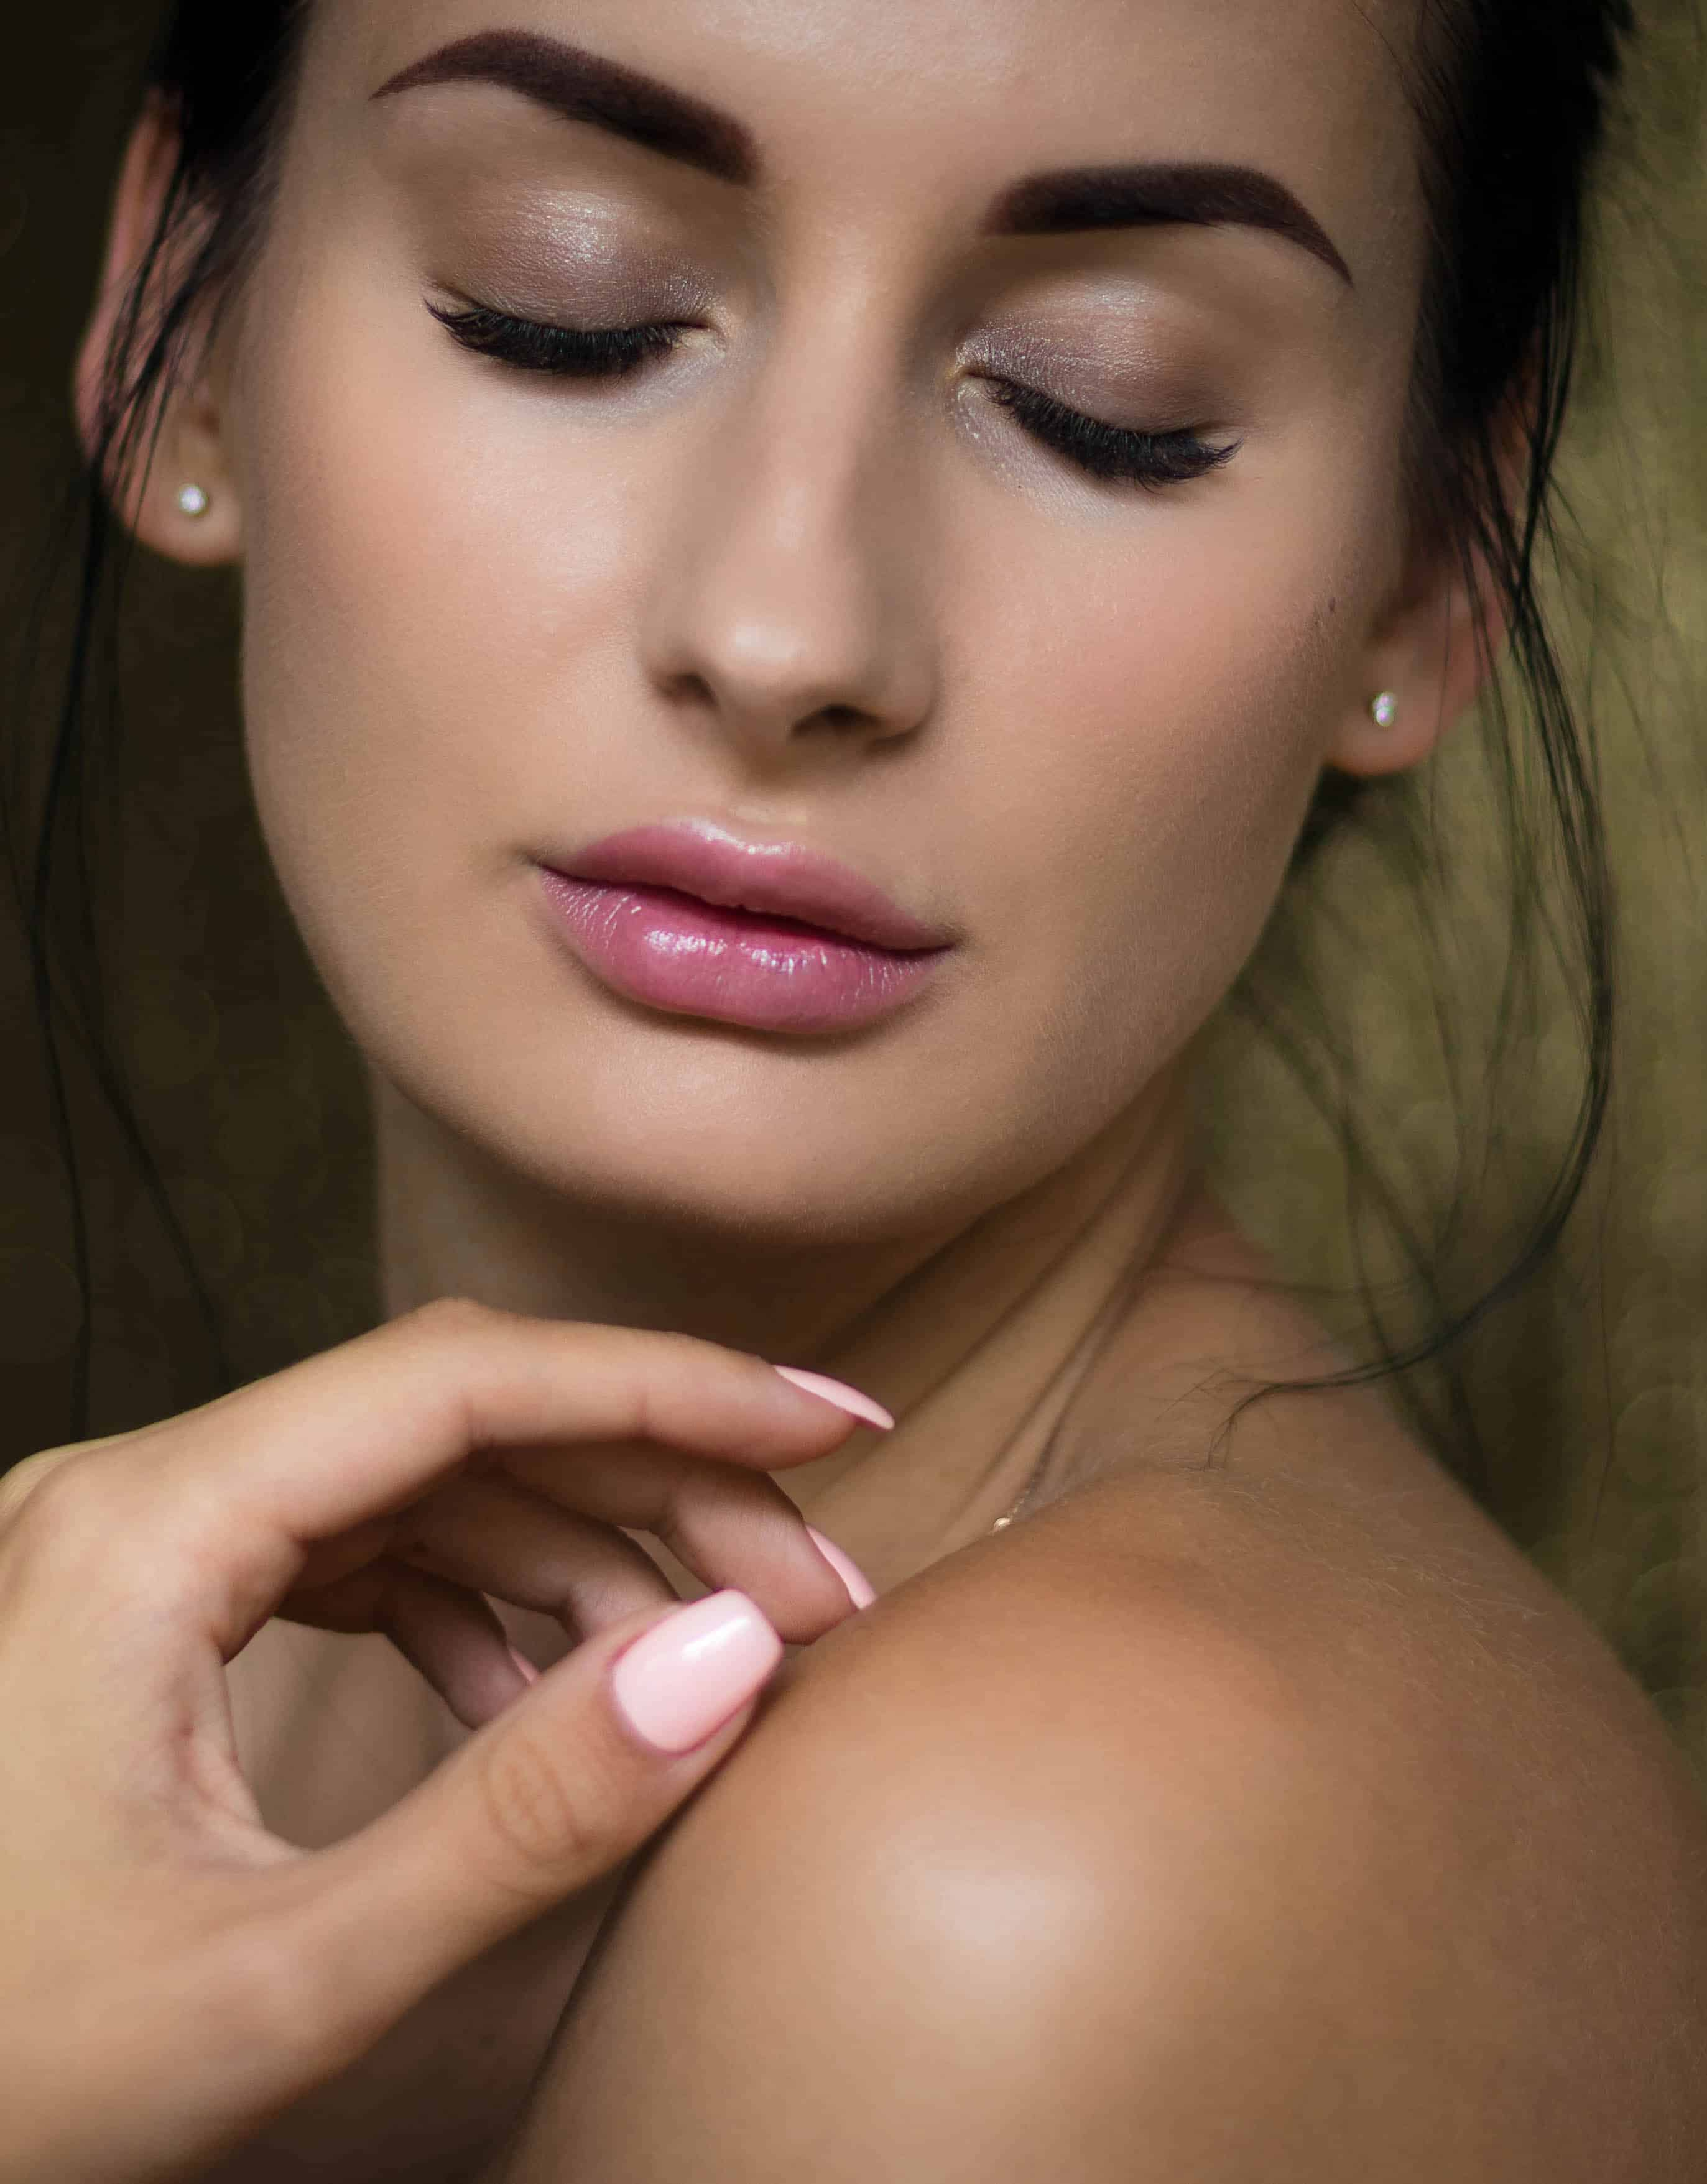 Botox Dermal Filler Model with lip augmentation